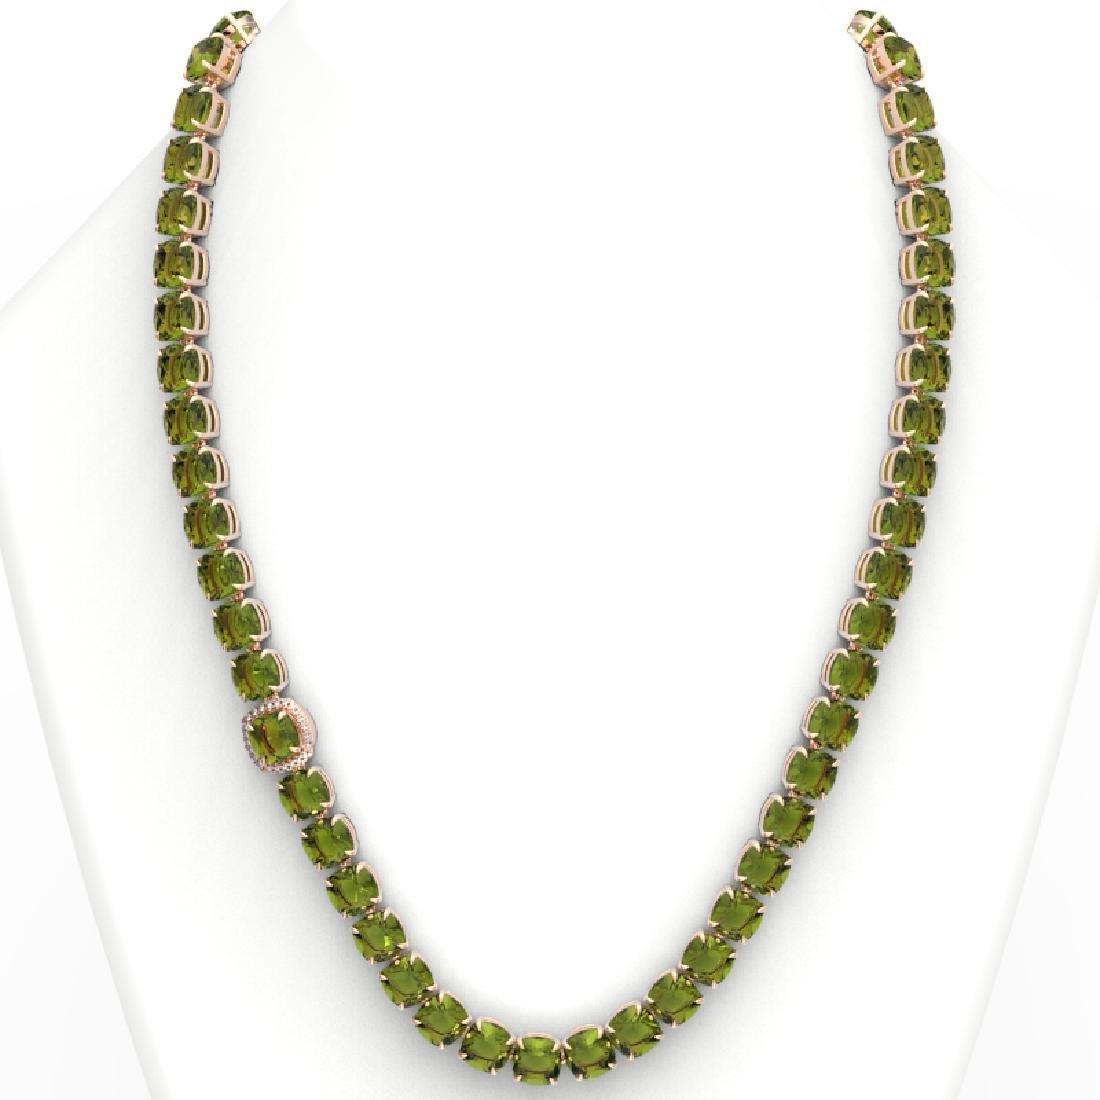 100 CTW Green Tourmaline & VS/SI Diamond Necklace 14K - 3